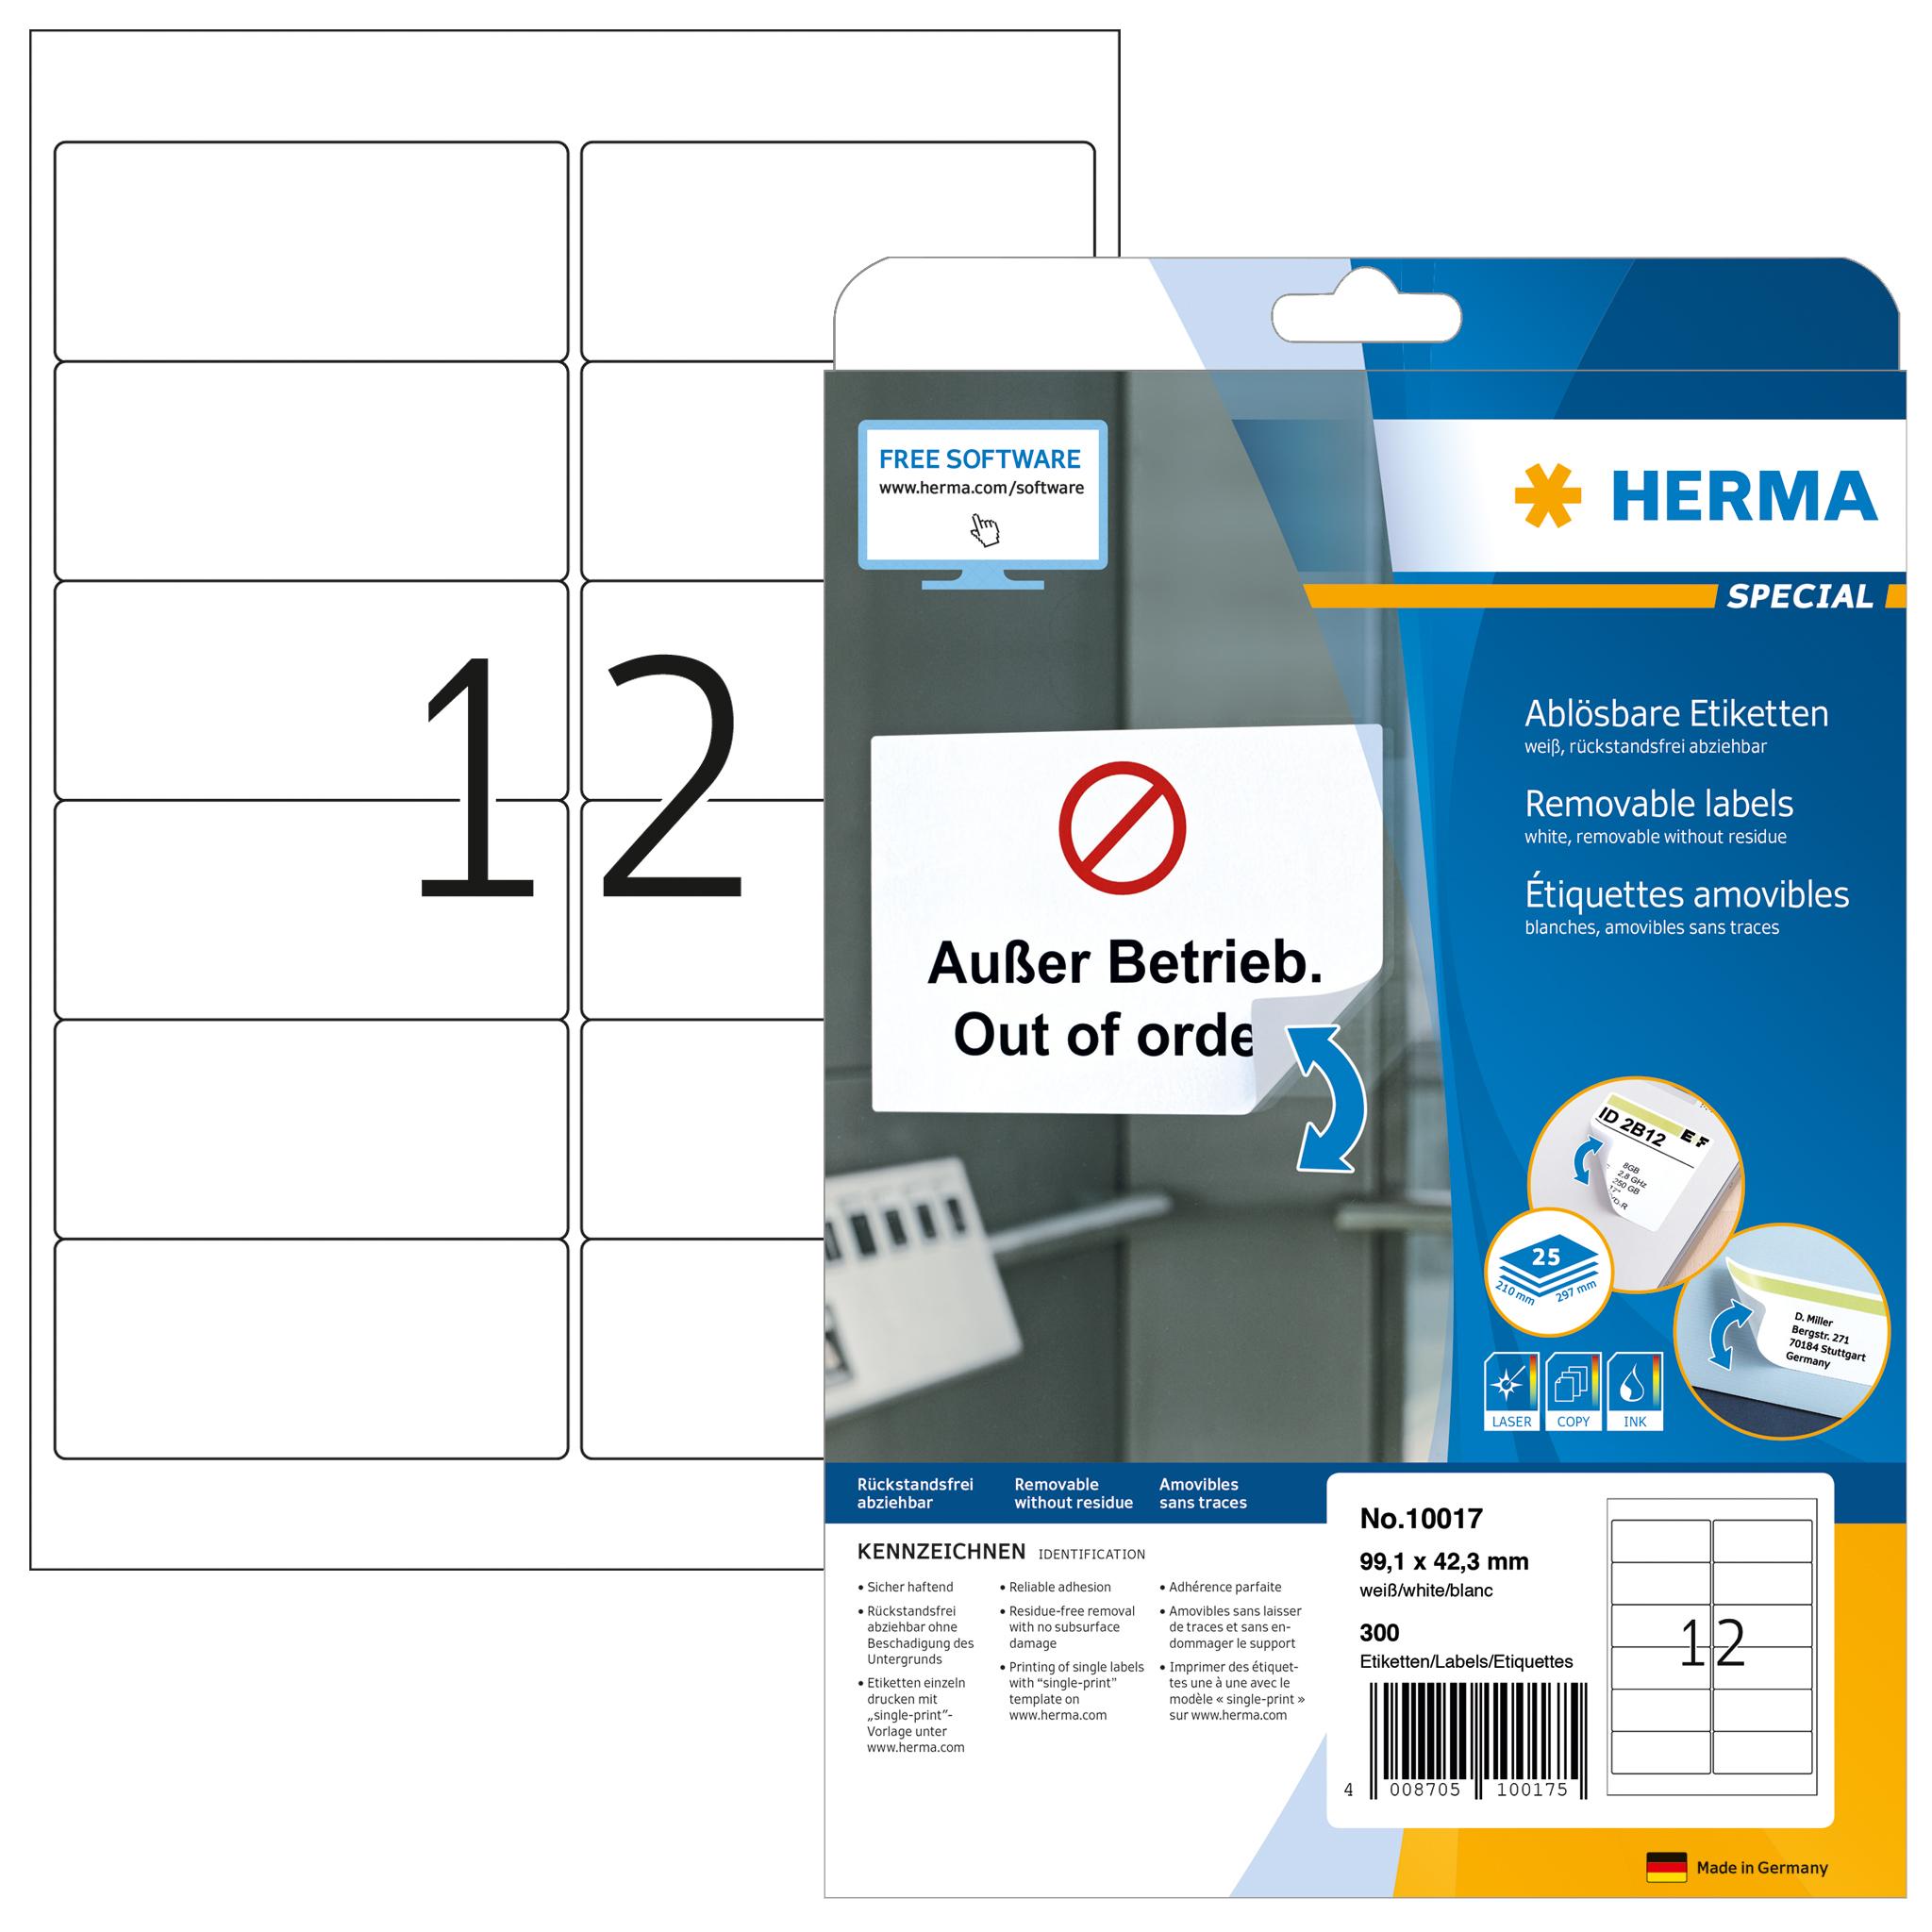 Ablösbare Adressetiketten A4 - HERMA 10017 - 99,1x42,3 mm 300 St.